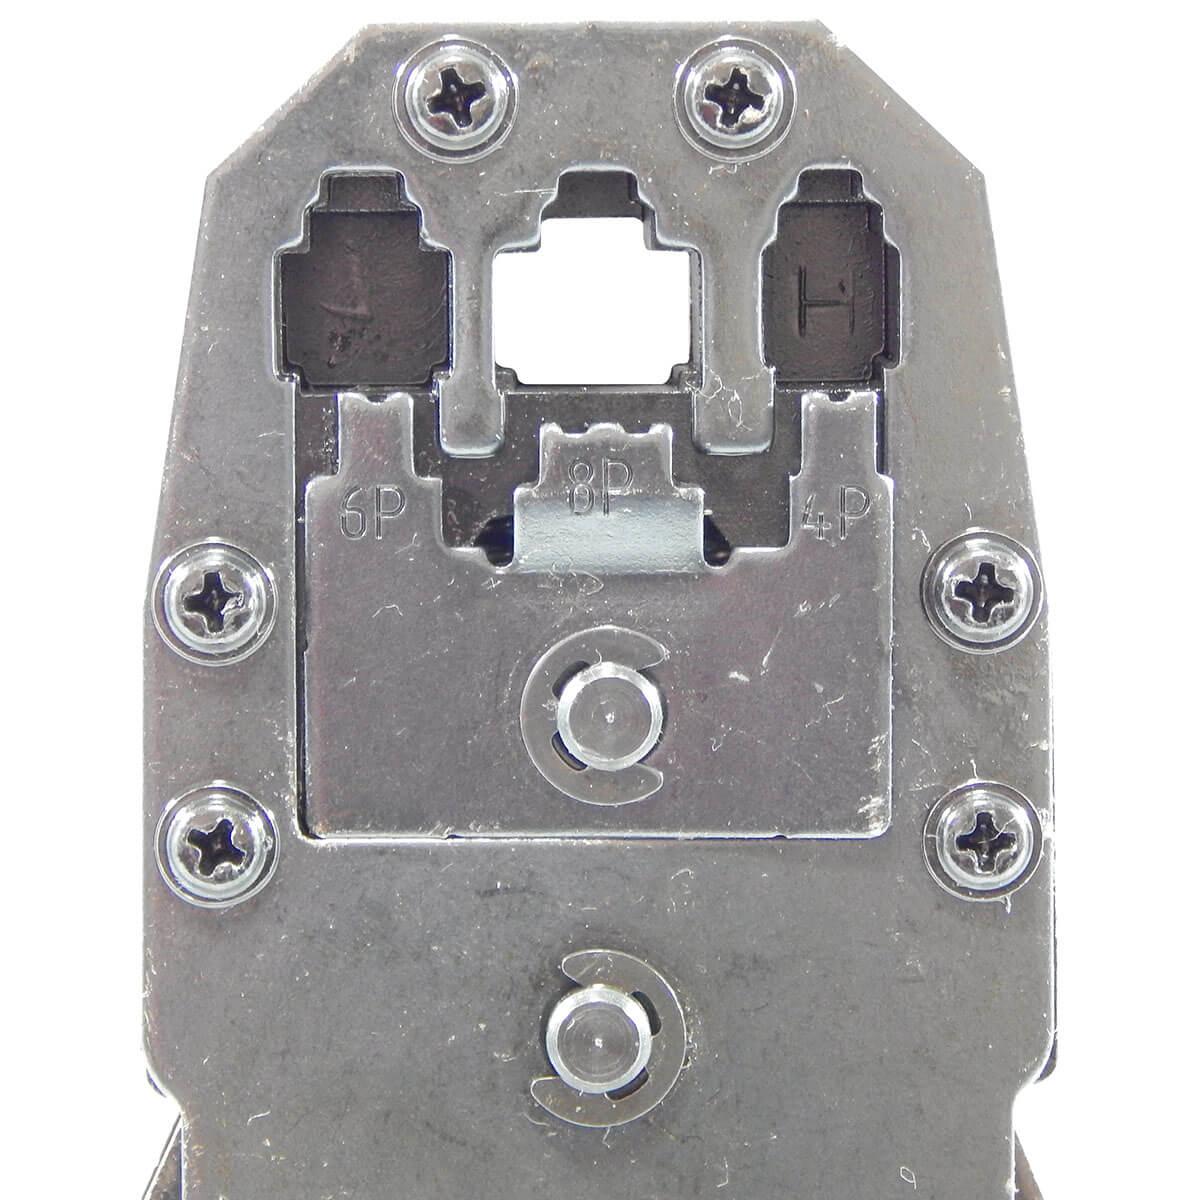 KIT Alicate p/ Crimpagem RJ45 e RJ11 + Alicate p/ Crimpar Coaxial + Alicate Decapador Cabo Coaxial + 100x Conectores RJ45+ Multímetro DT-830B